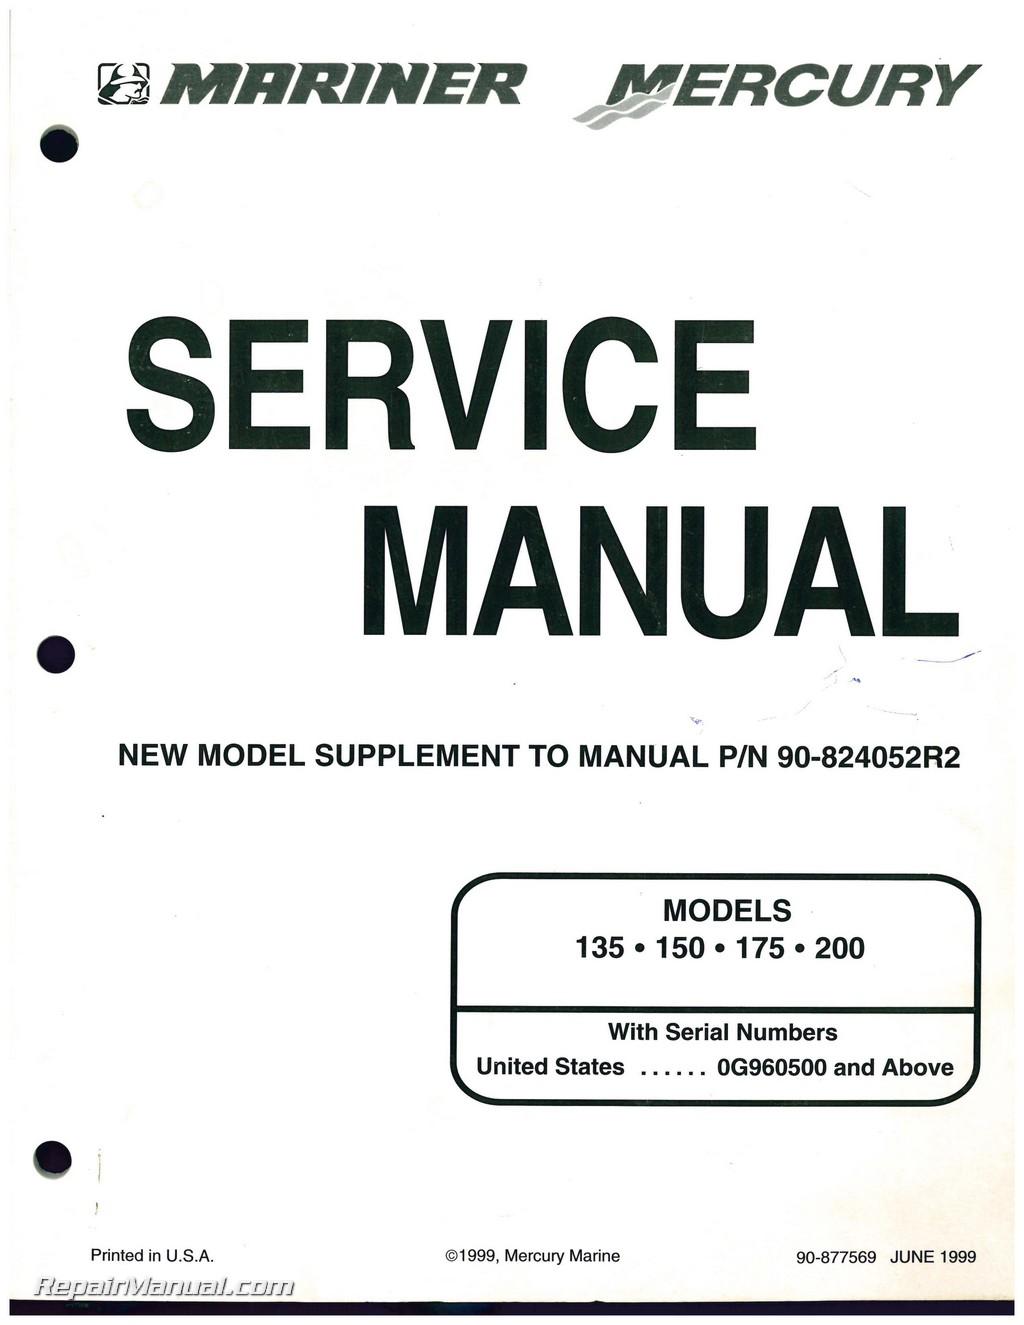 Used Mariner Mercury 135 • 150 • 175 • 200 Marine Engine Service Manual  Supplement